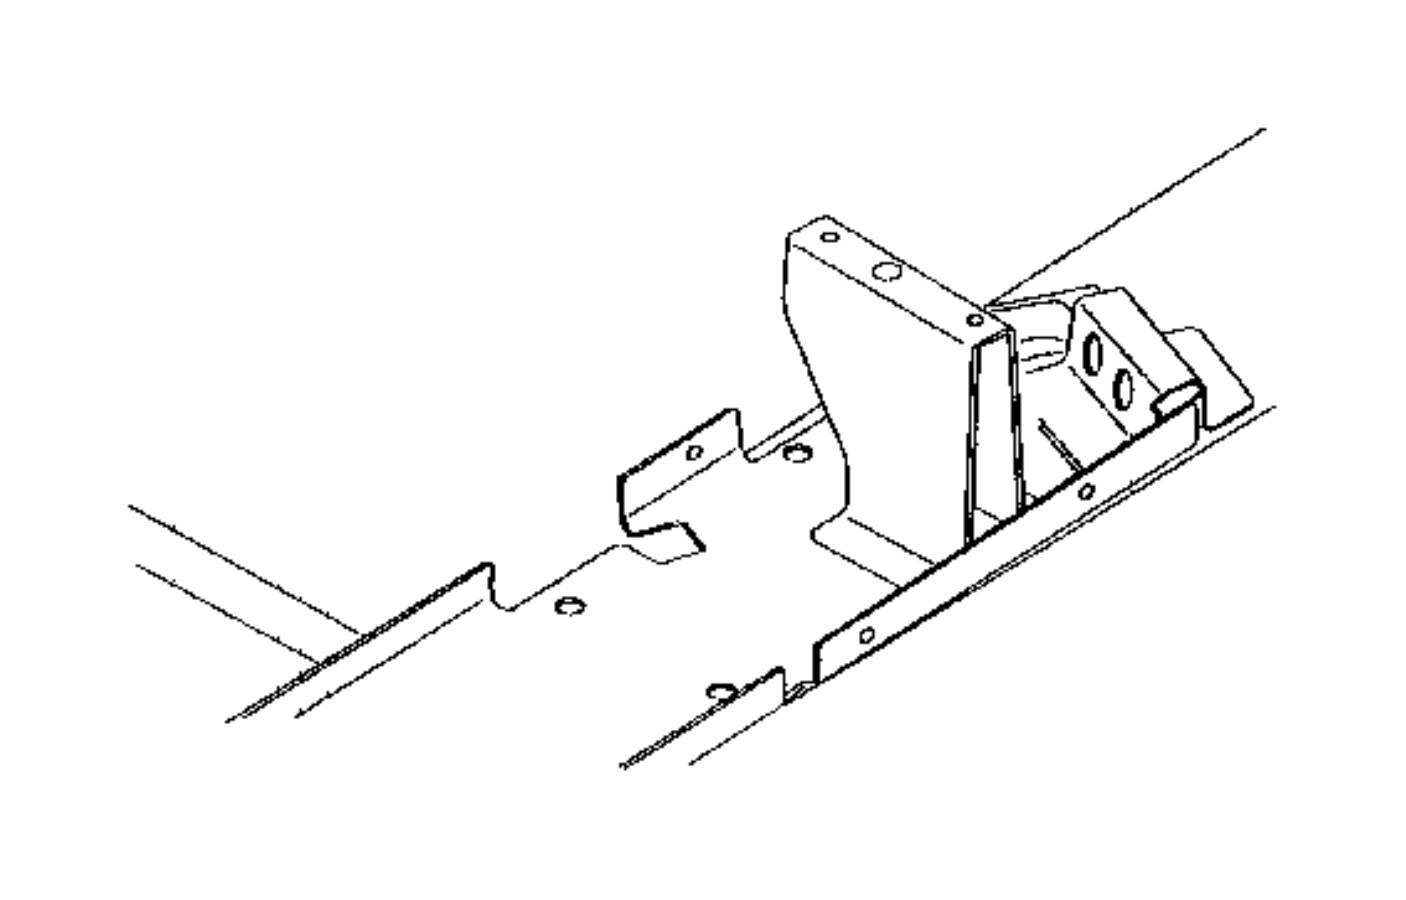 Plymouth Prowler Screw. Pan head. 437-20x1.375. Seatouter